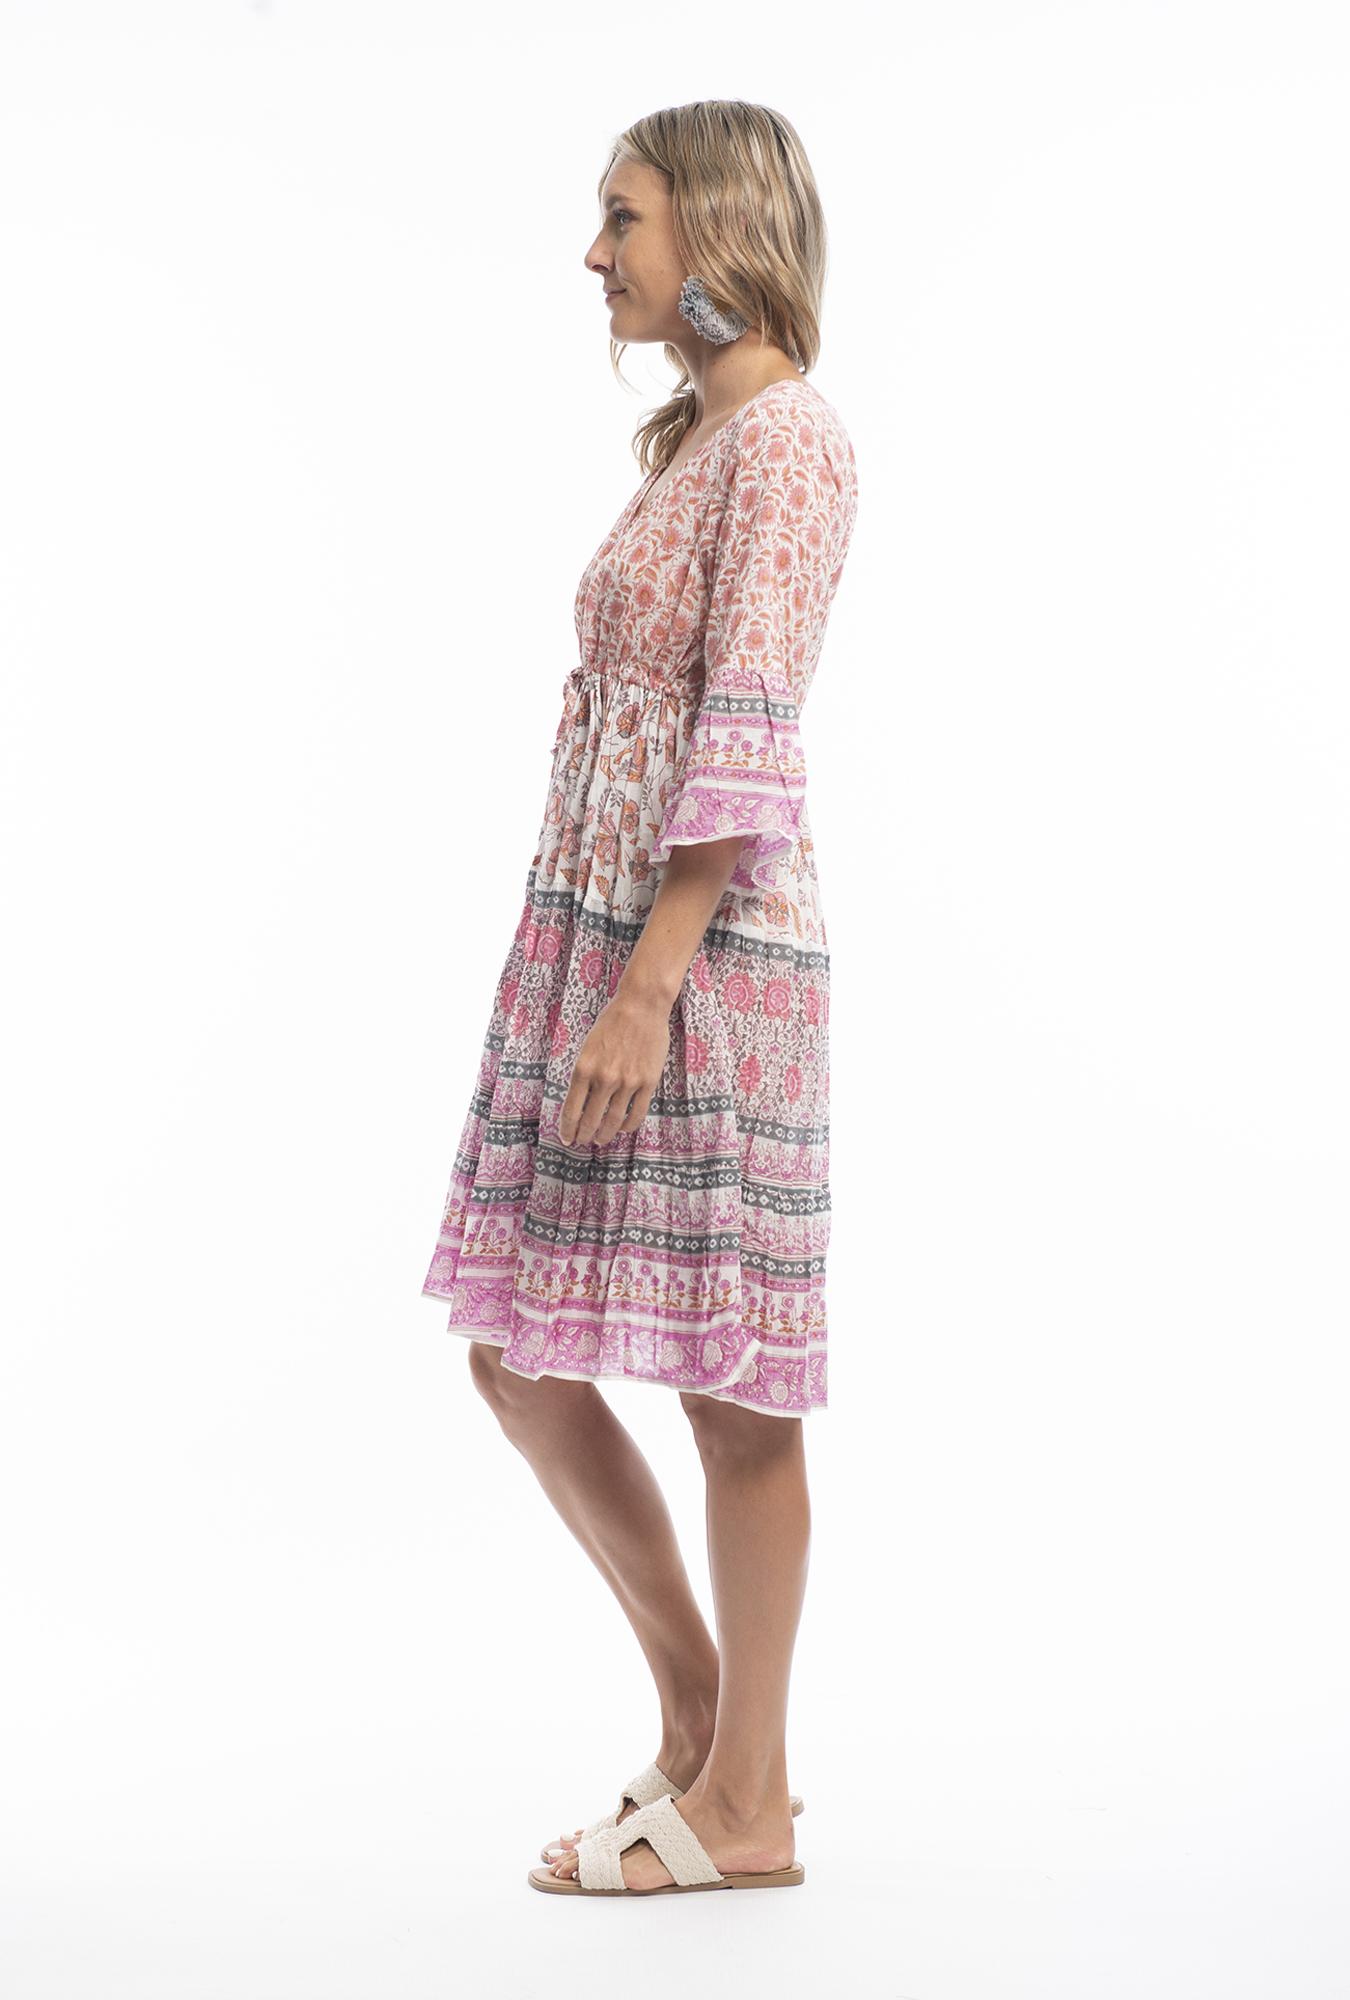 Matilda Dress in Rabat